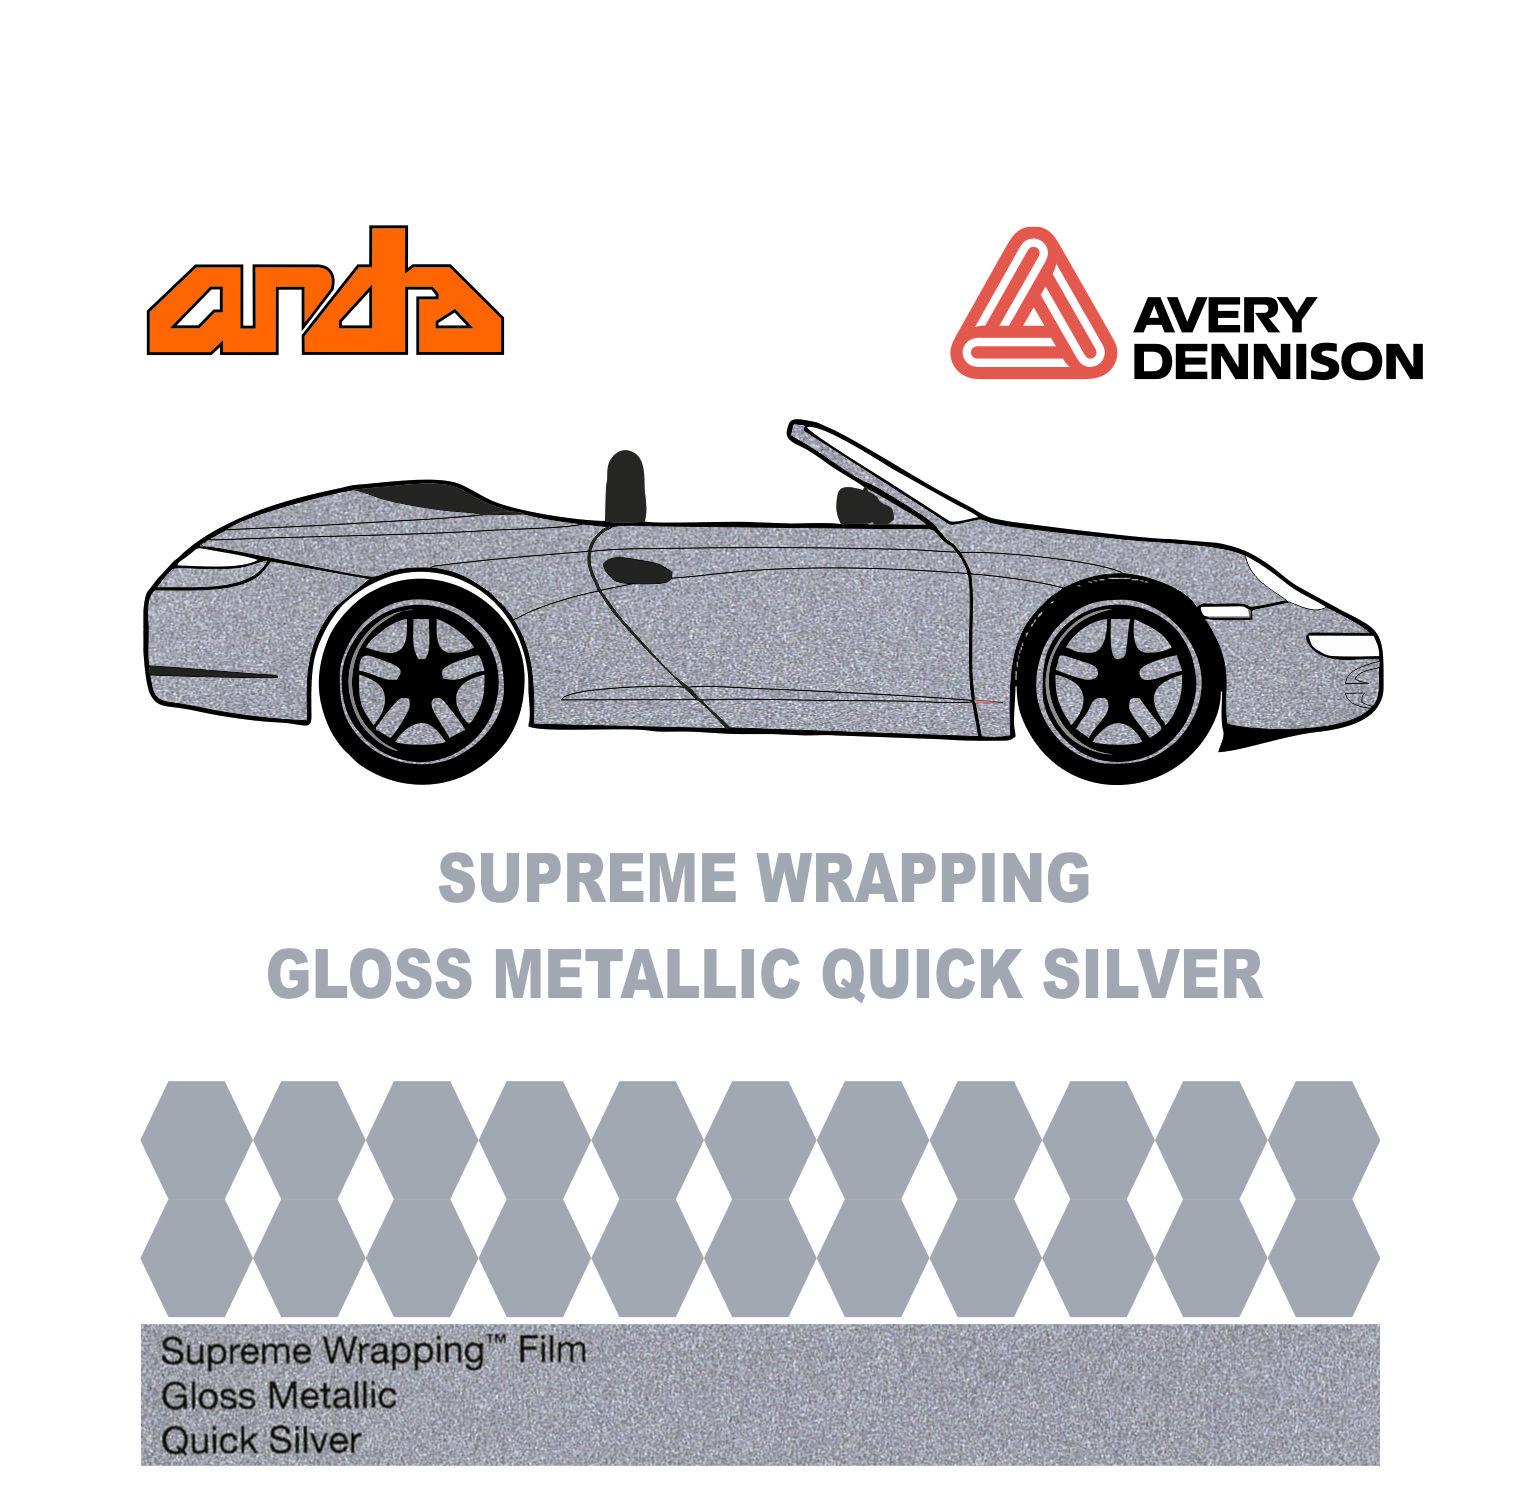 Avery Dennison- SWF Gloss Quick Silver 1